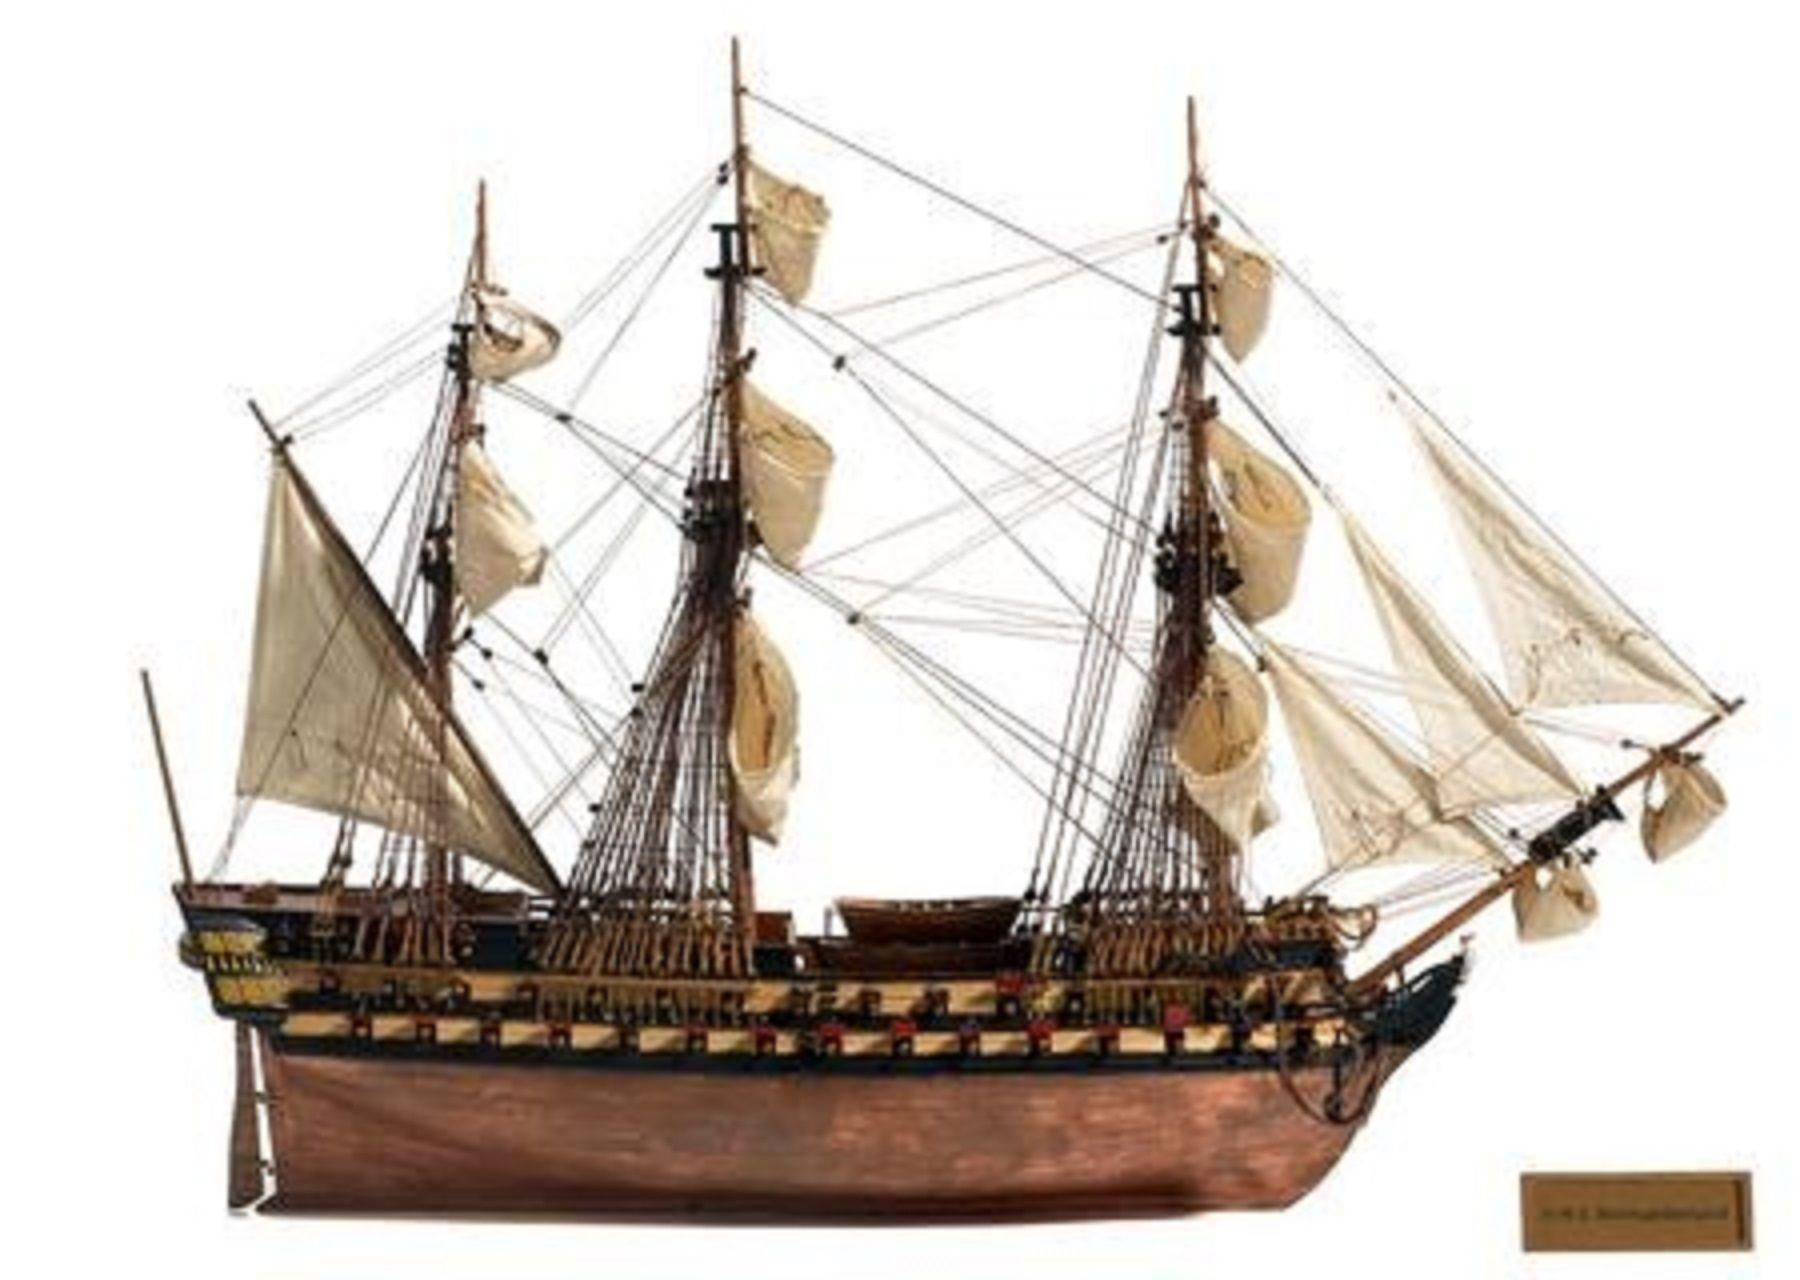 219-7357-HMS-Northumberland-model-ship-Premier-Range